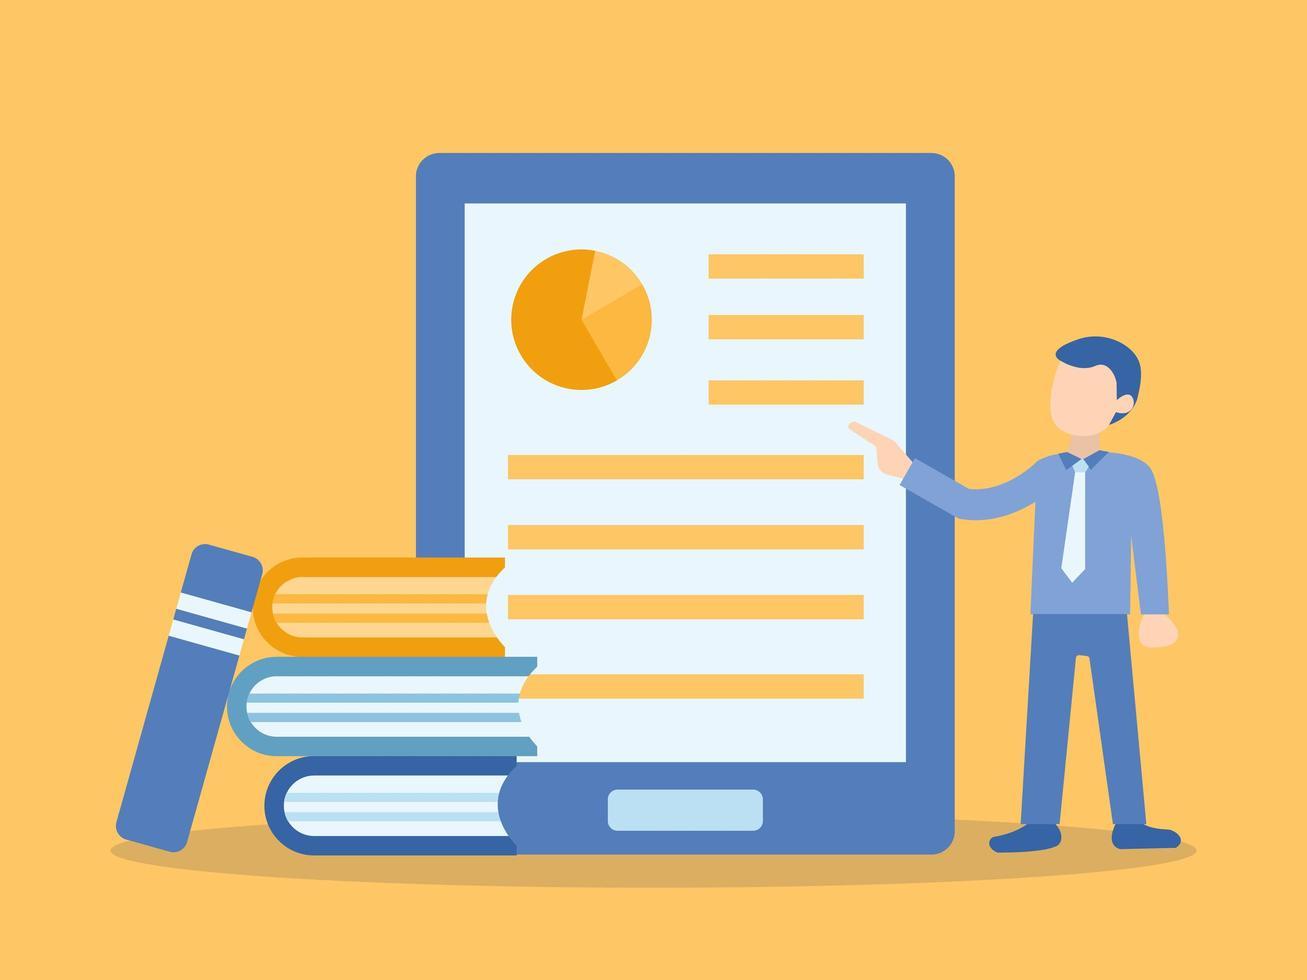 man lesgeven online cursus in tablet vector